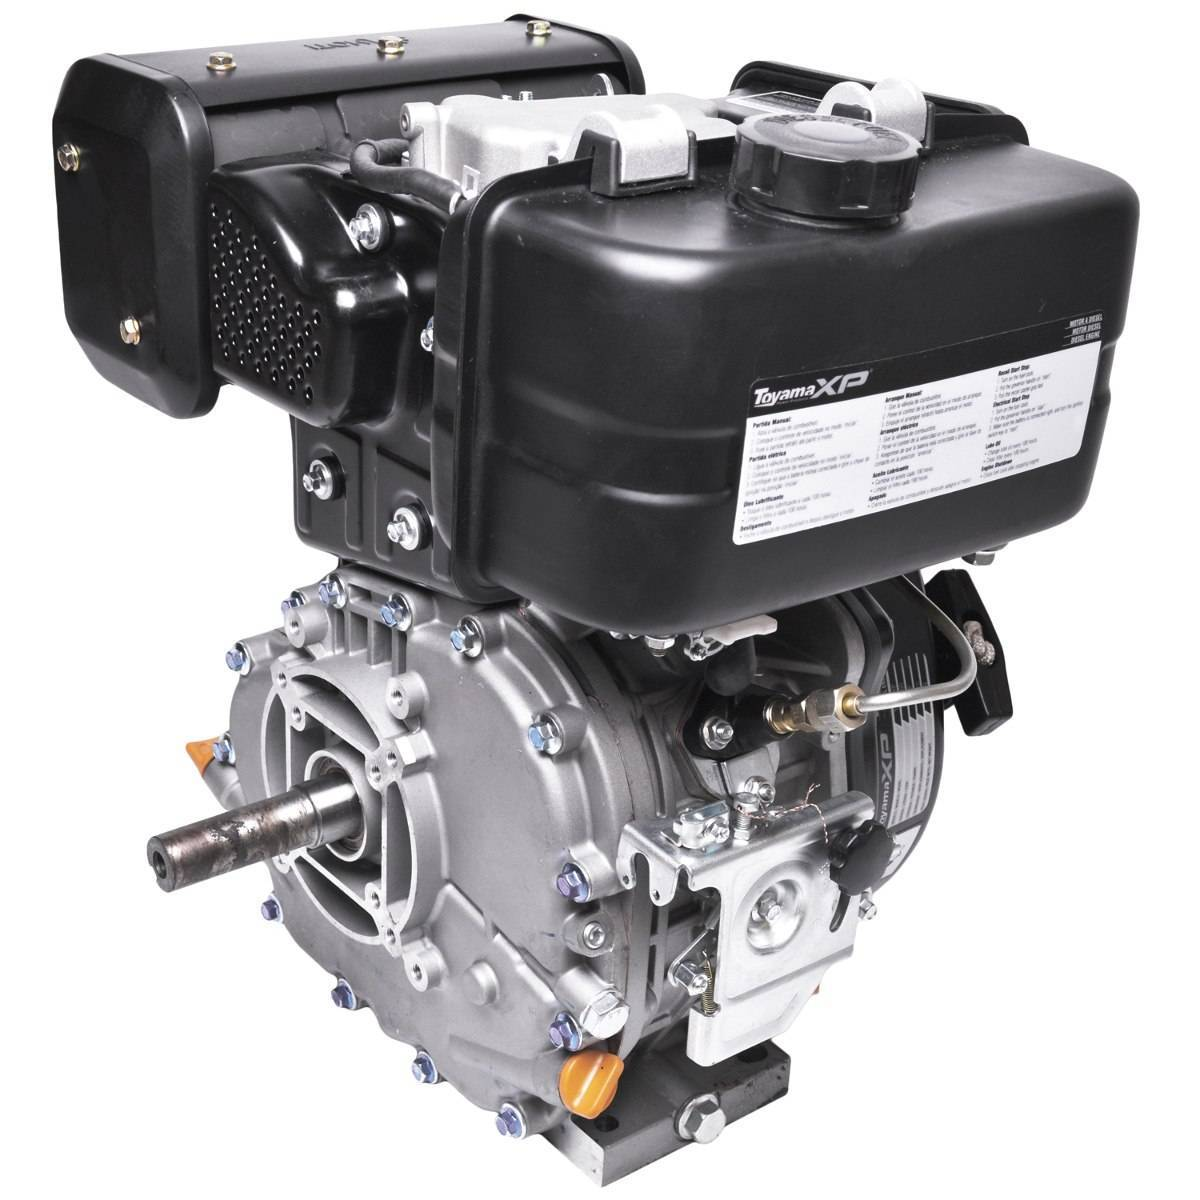 Motor TOYAMA 11 HP diesel eixo 1